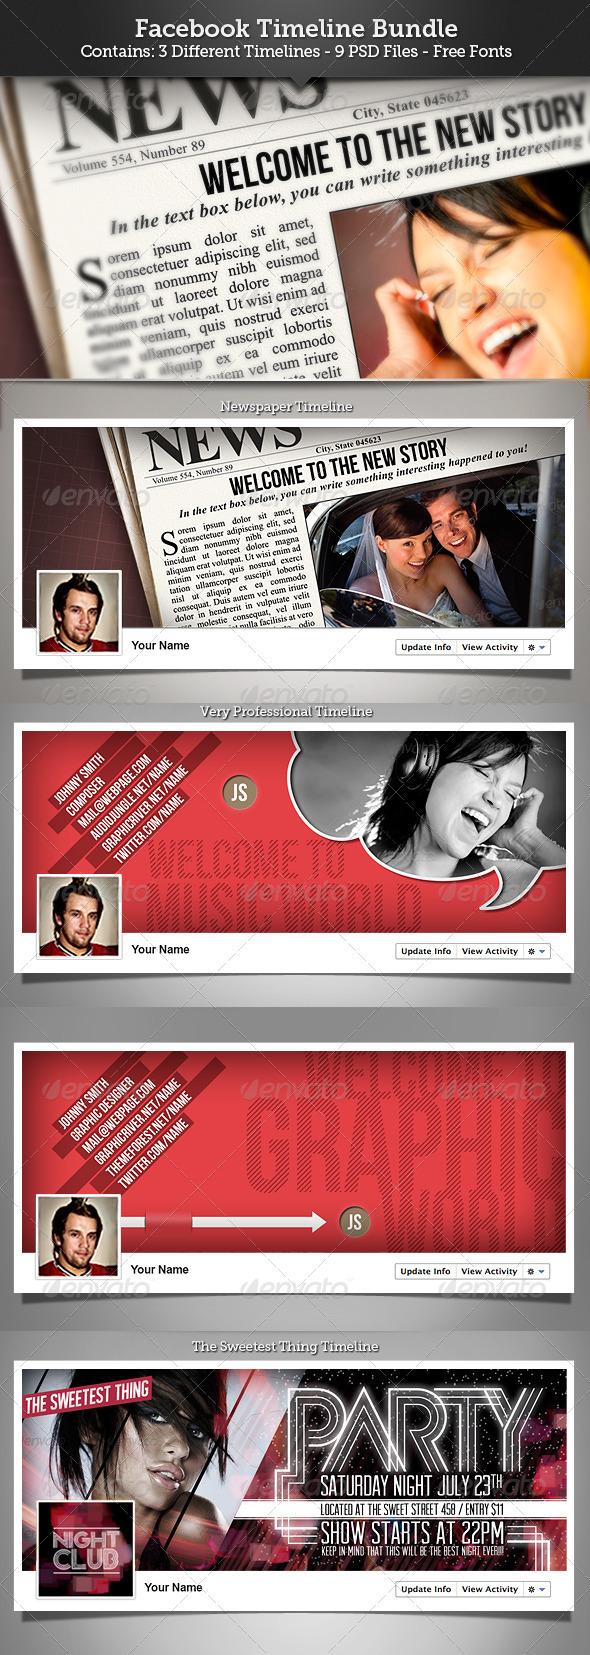 GraphicRiver FB Timeline Cover Bundle 3411671